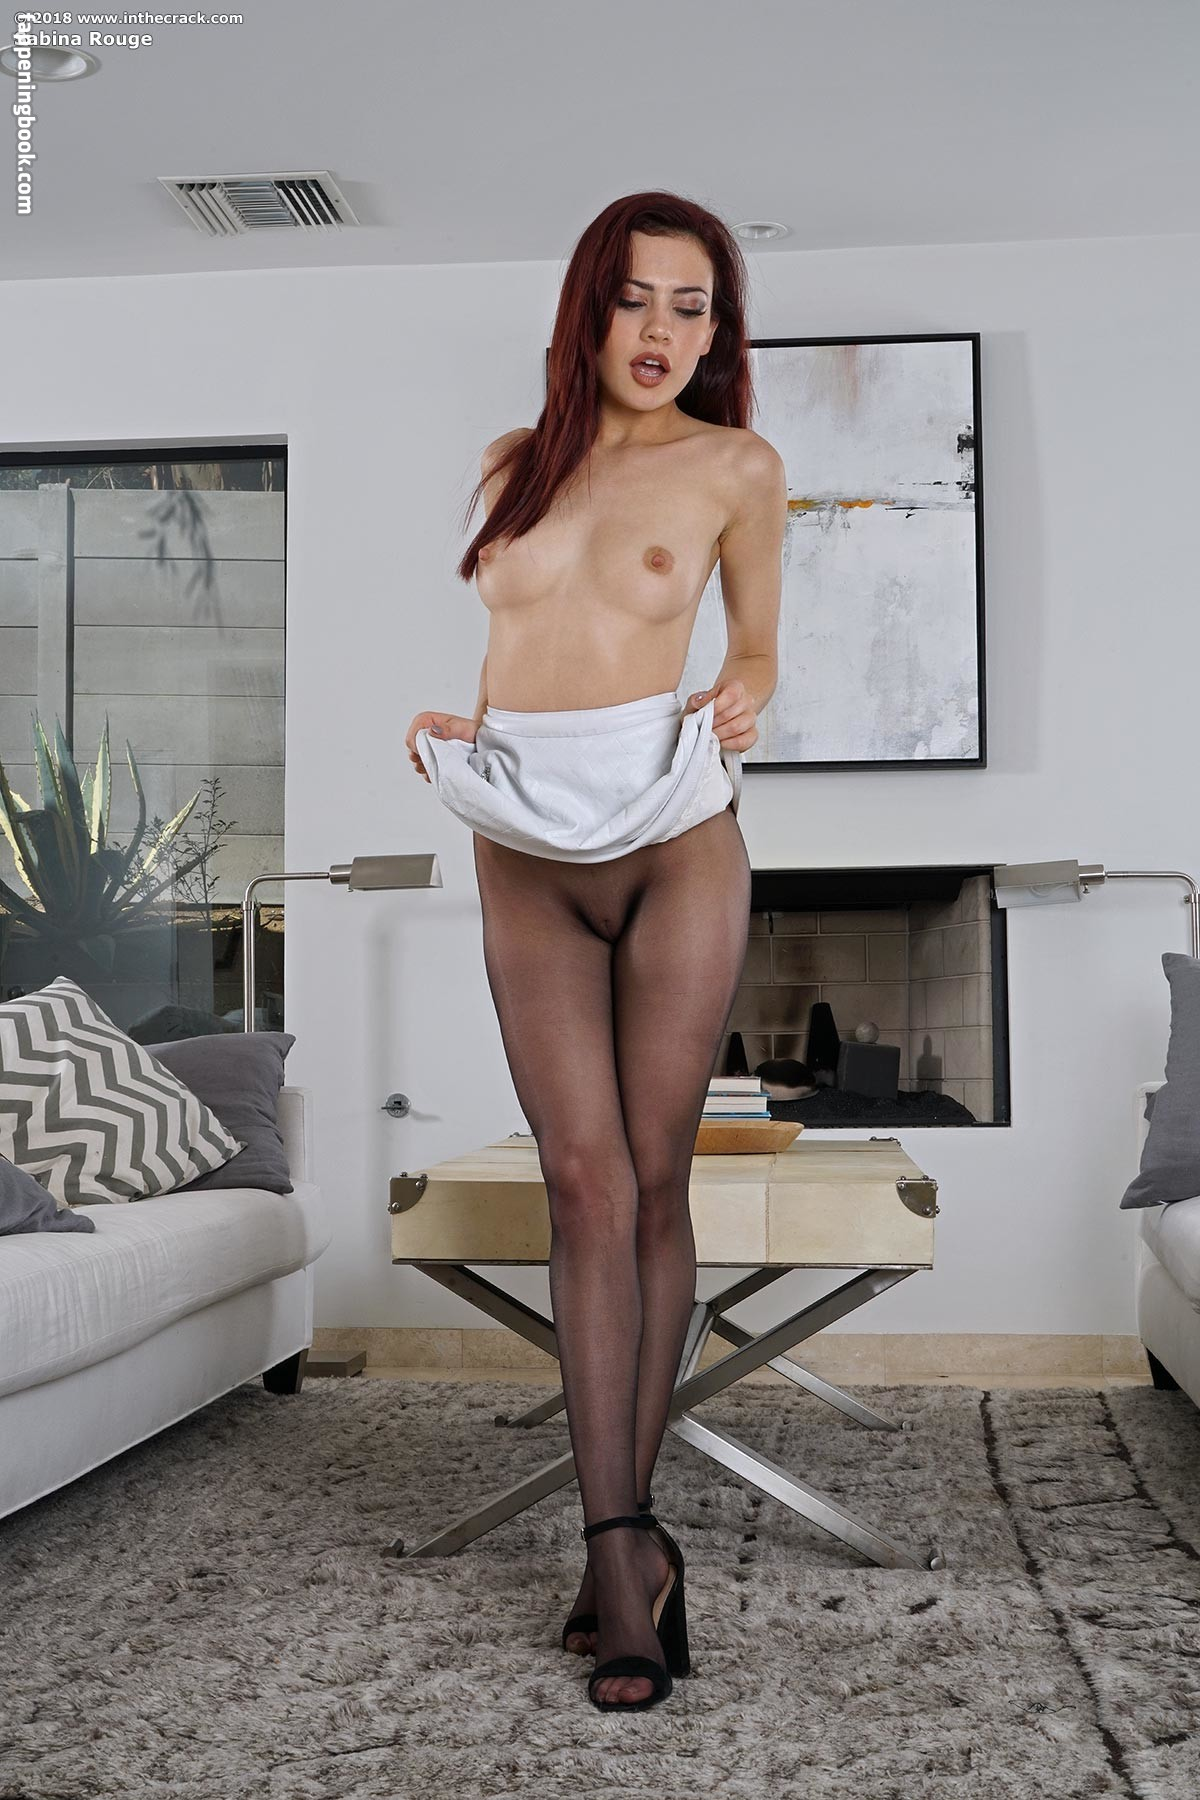 Sabina Rouge Nude